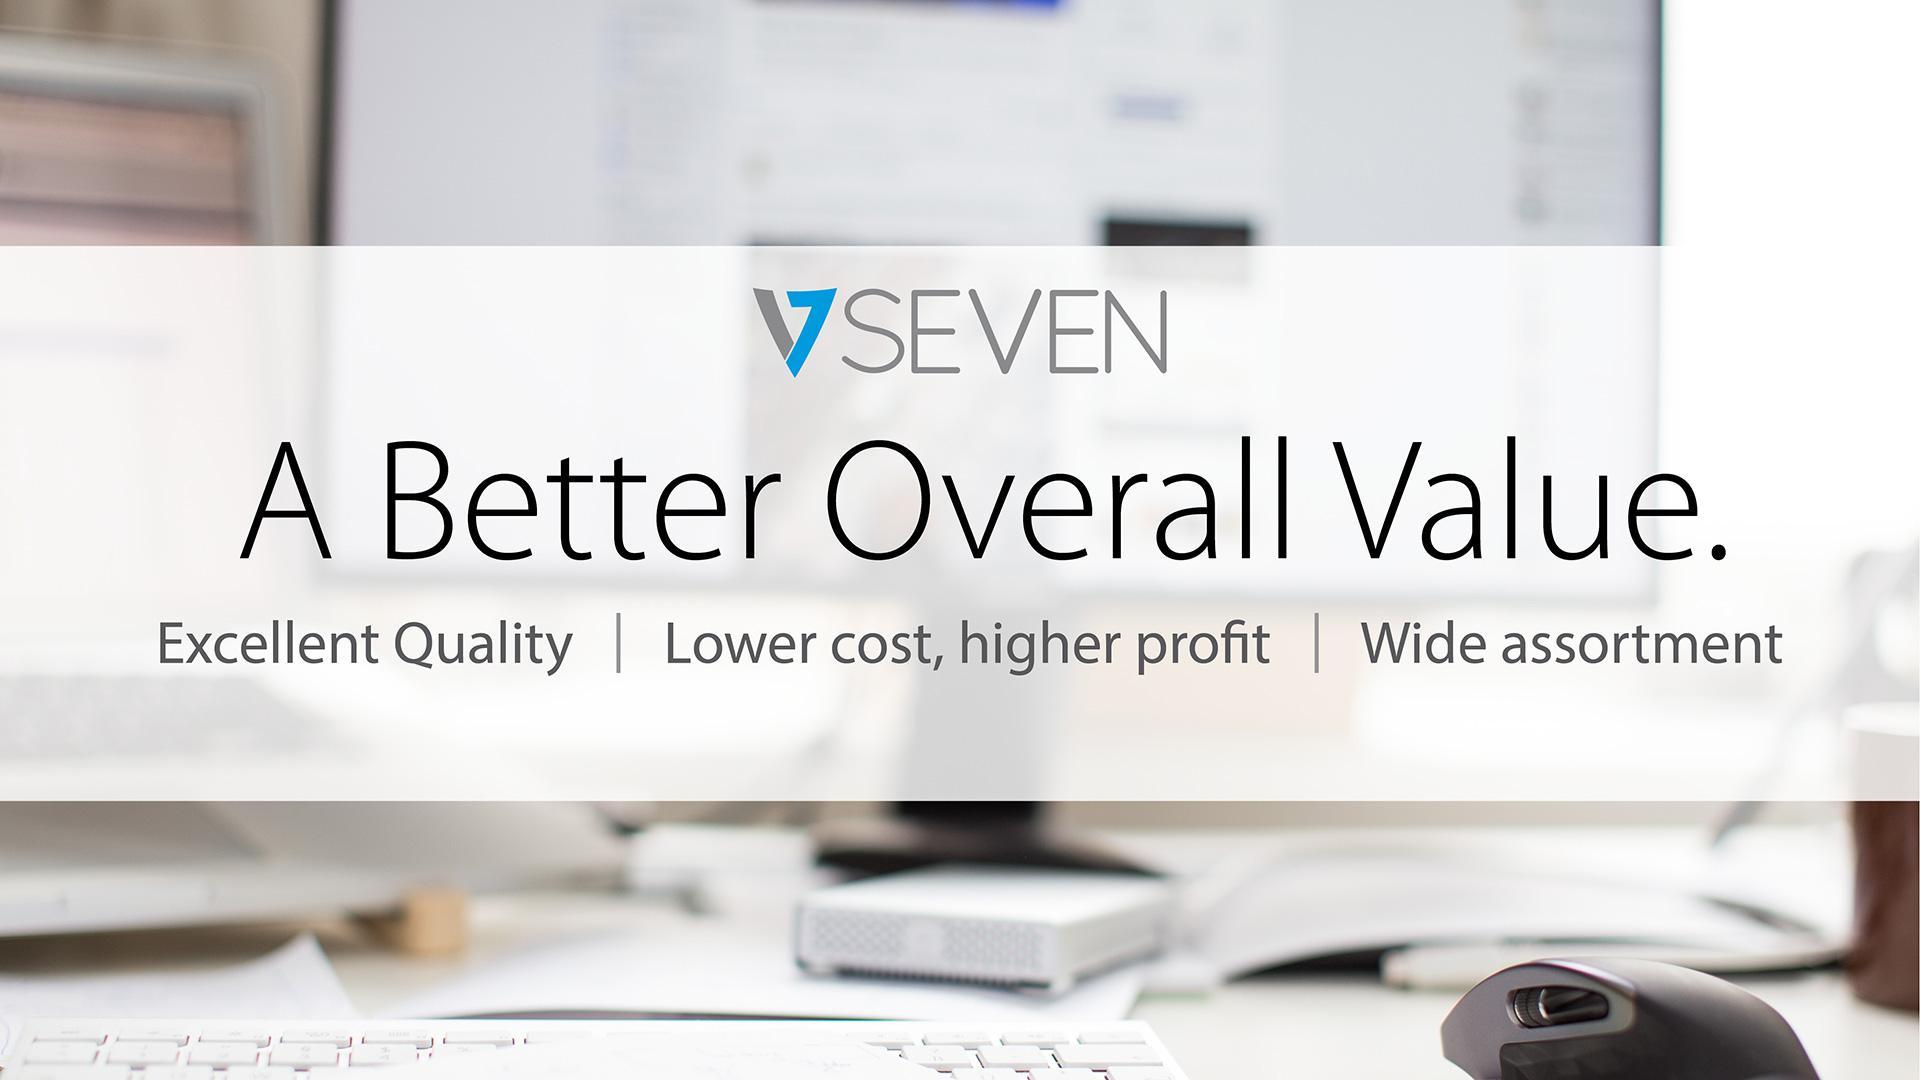 The V7 Value